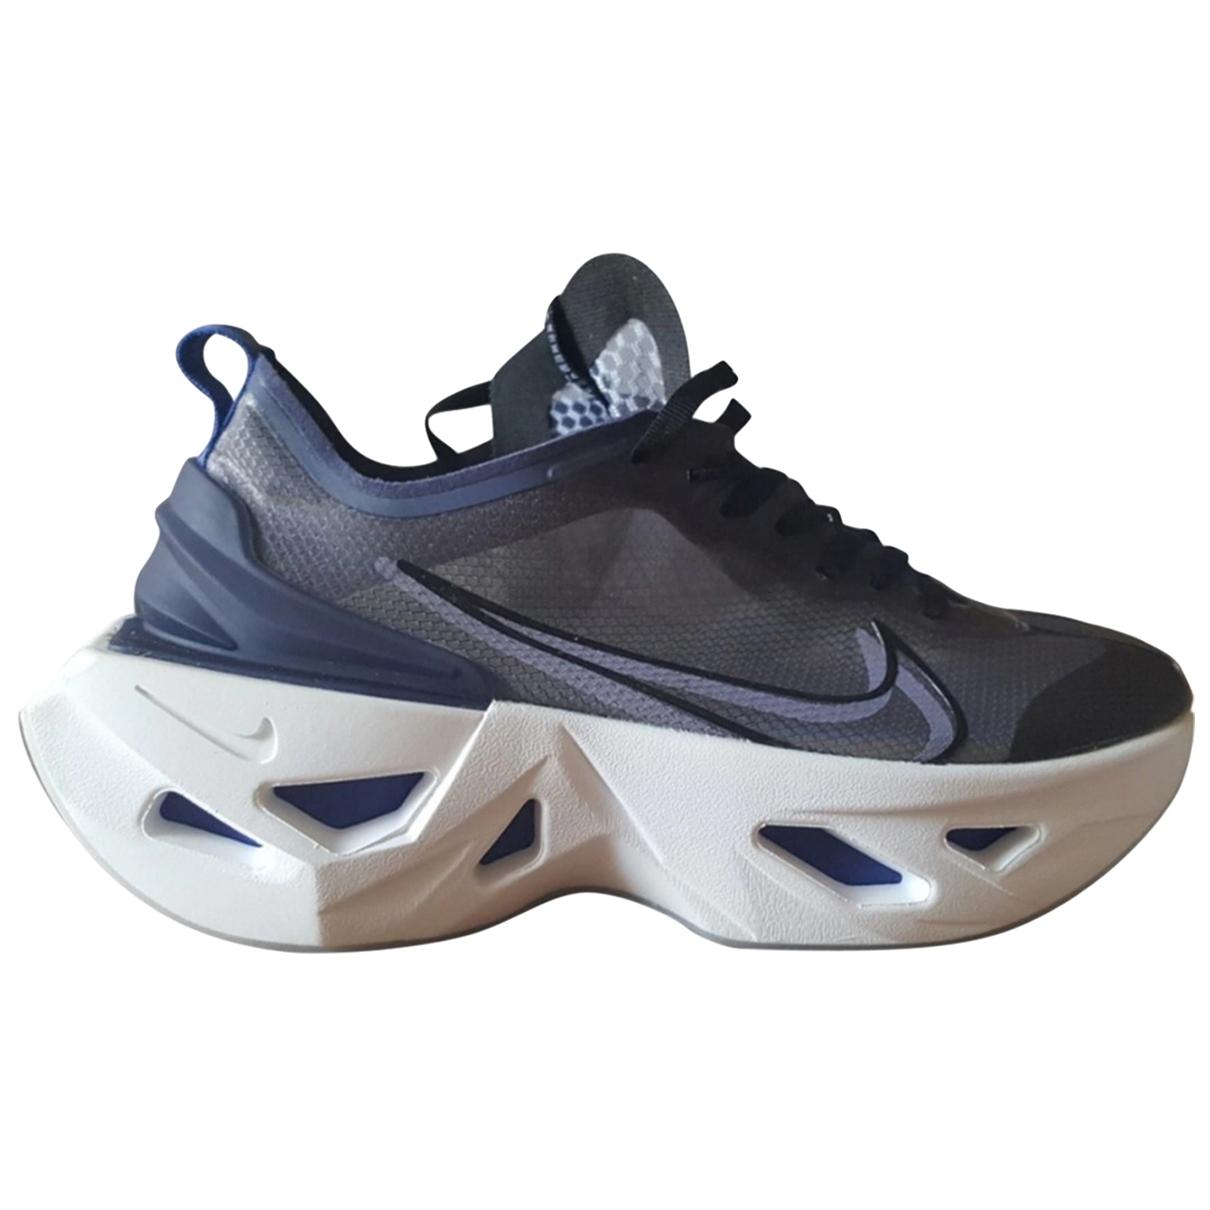 Deportivas Zoom X Vista Grind Nike